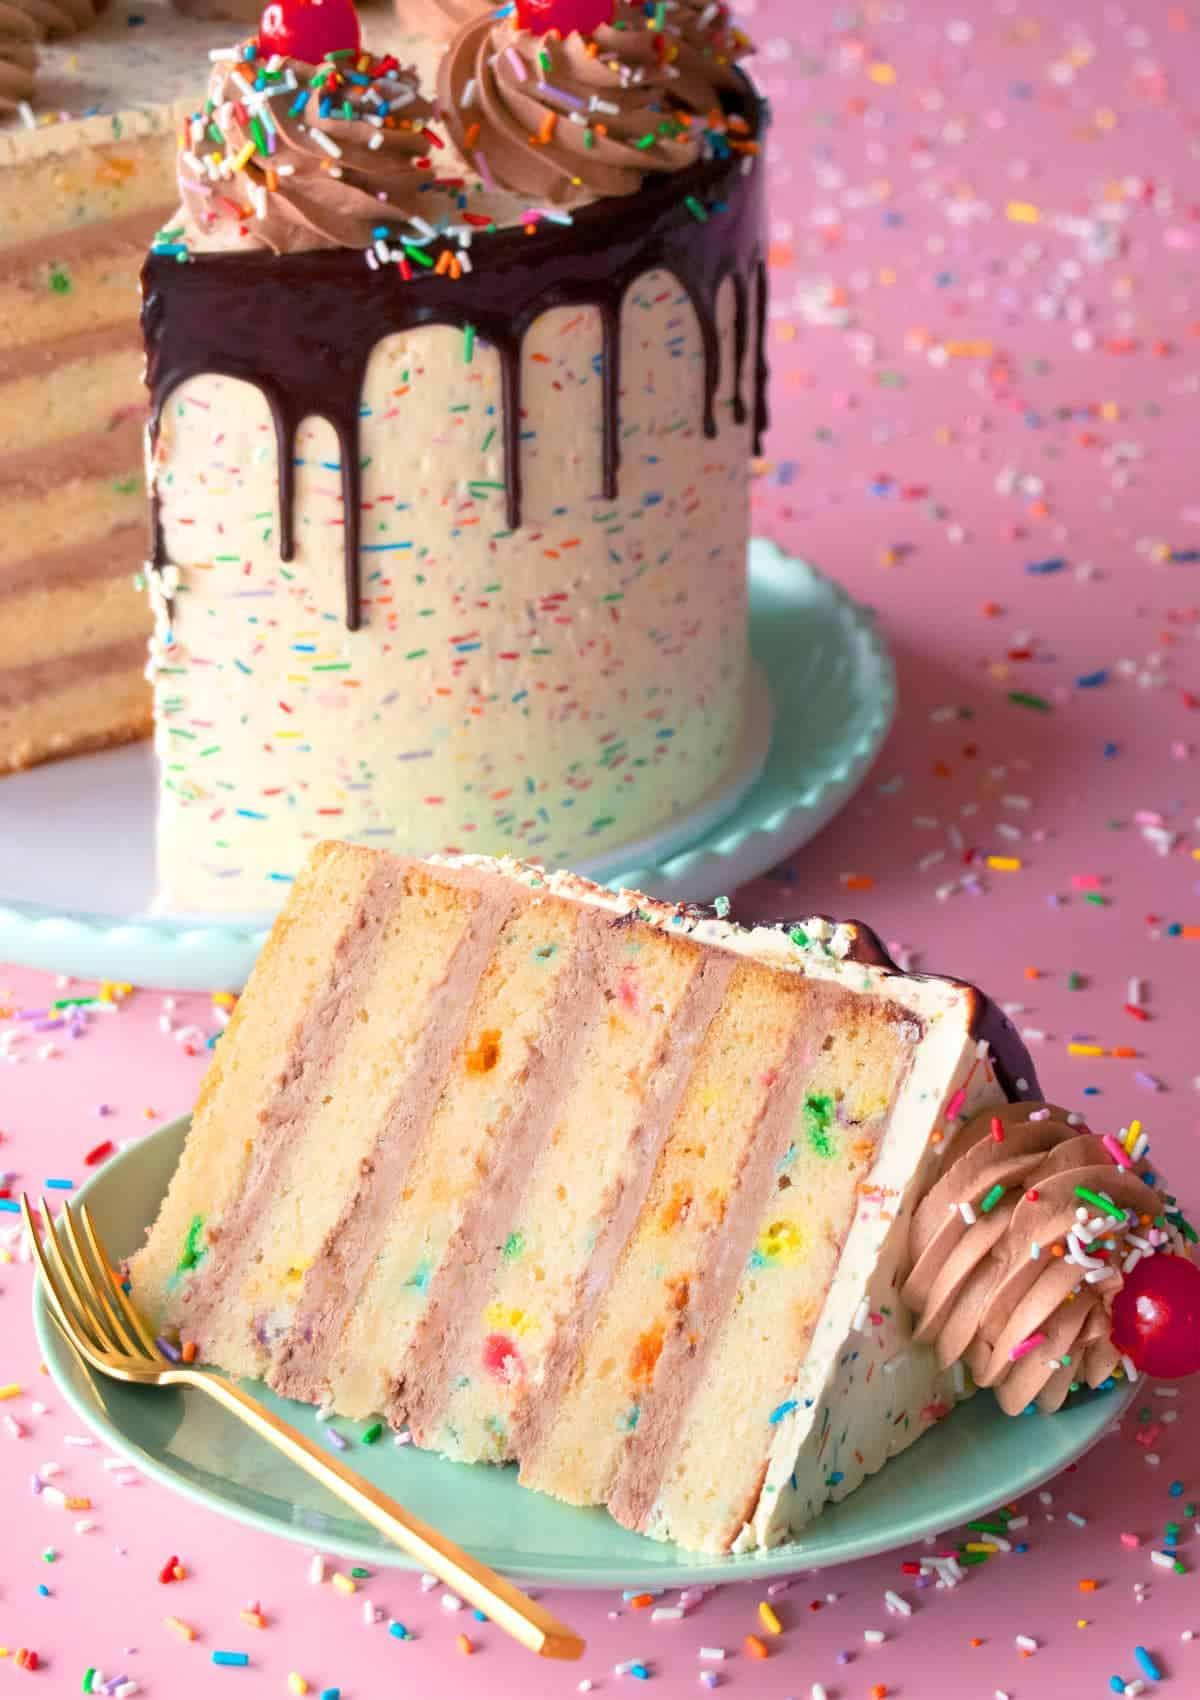 Slice of Classic Vanilla Funfetti Cake sitting on a plate.